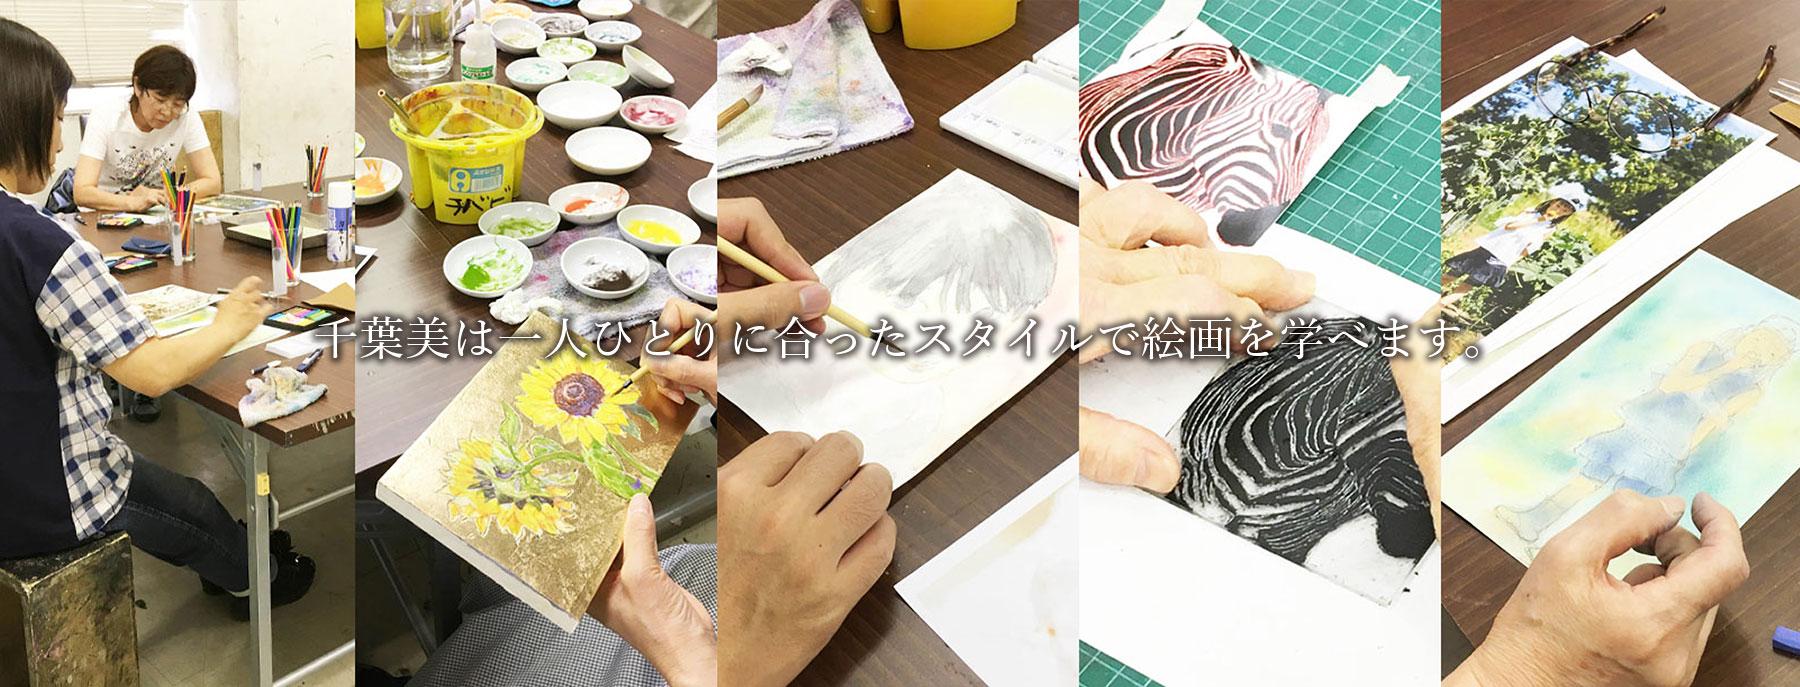 一般絵画教室/千葉の絵画教室